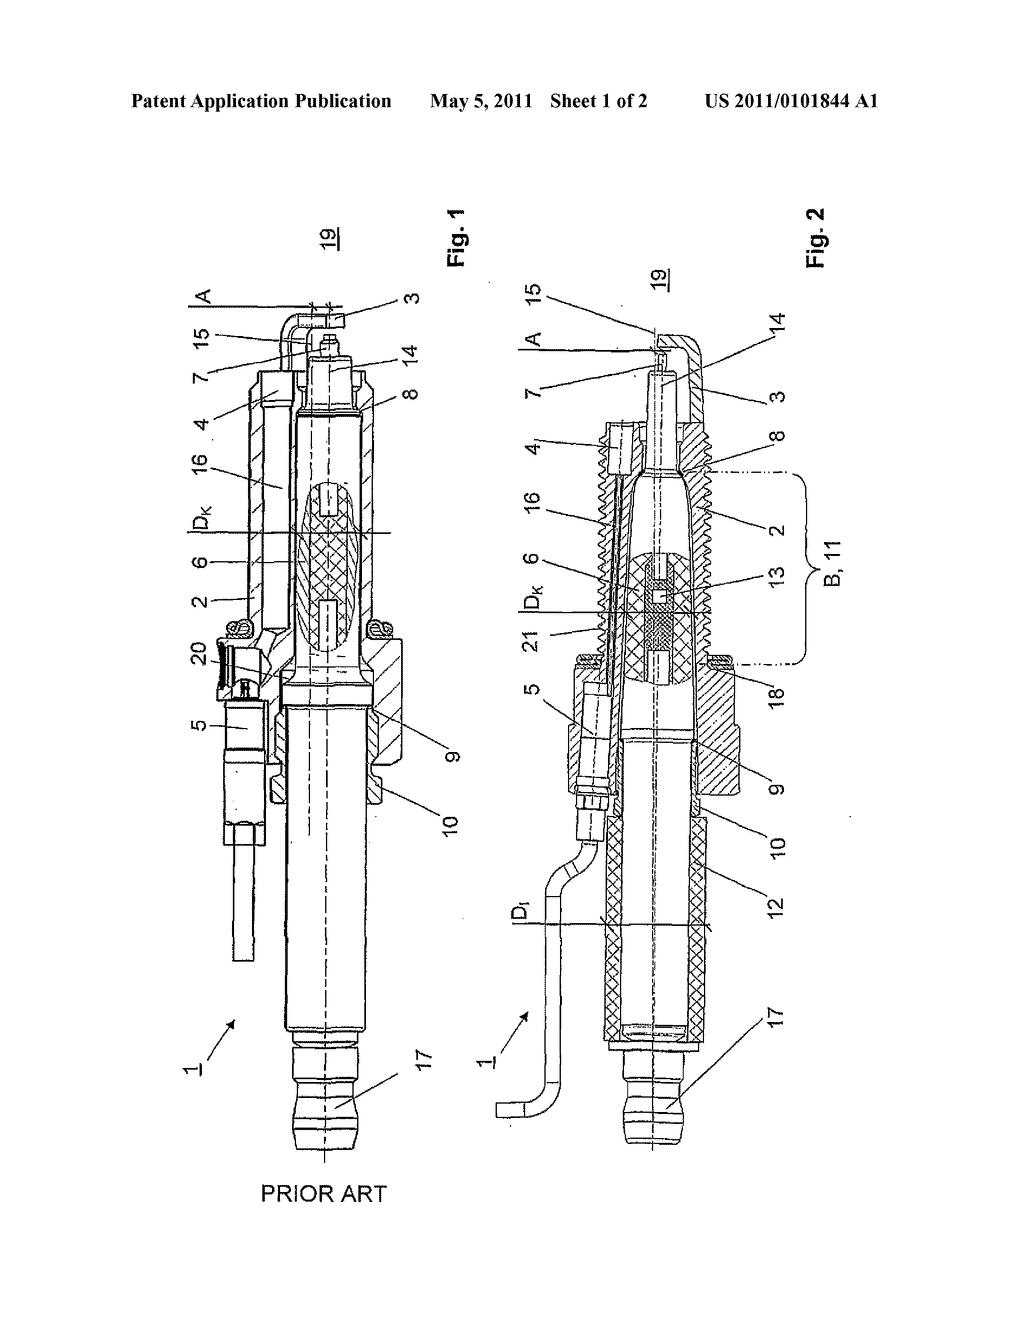 spark plug schematic schematics wiring diagrams u2022 rh hokispokisrecords com spark plug schematic diagram